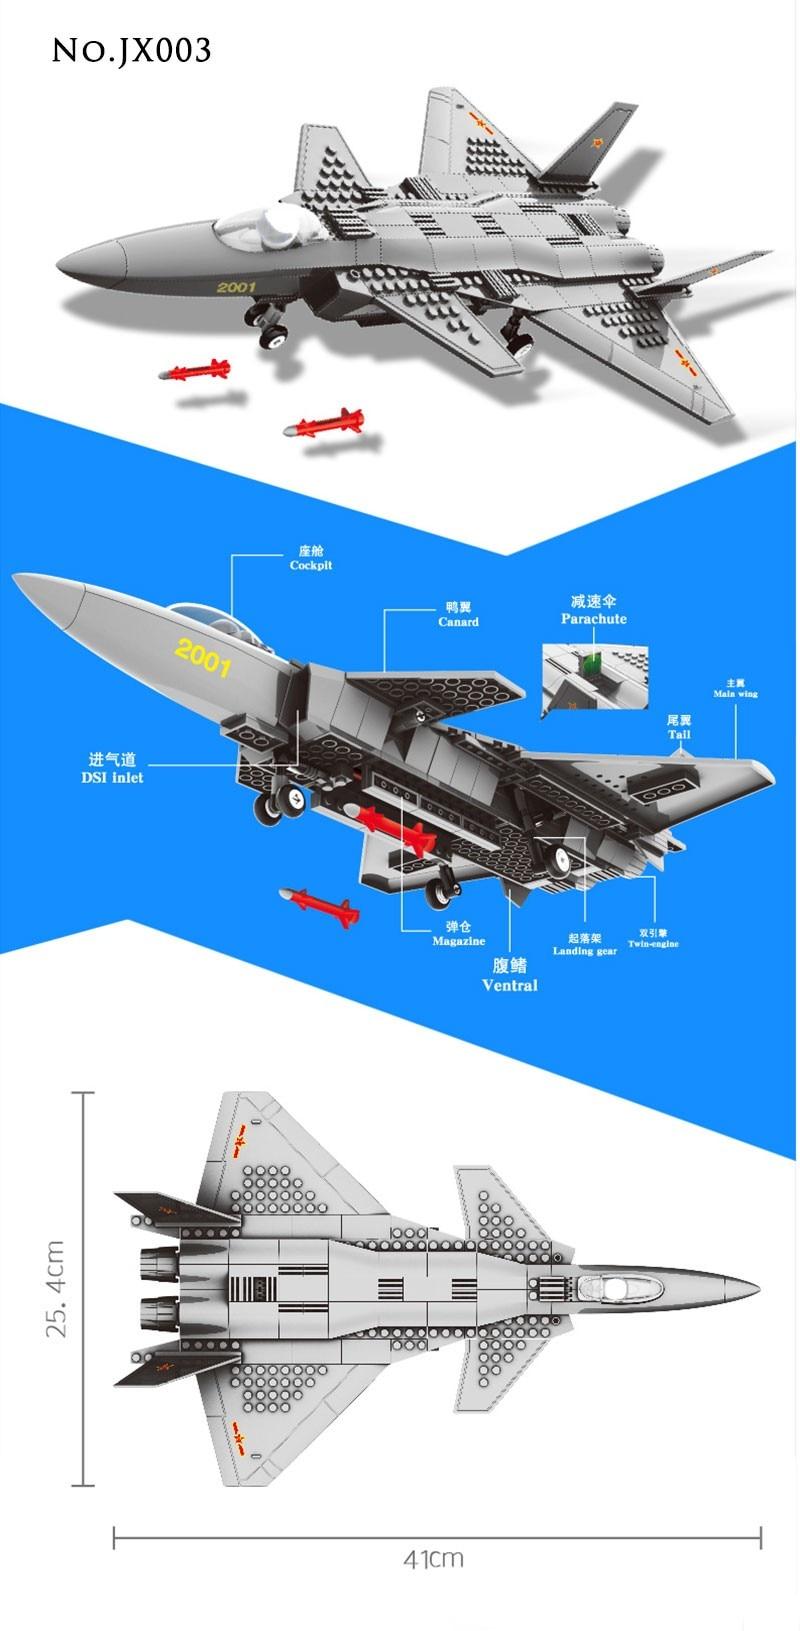 Wange Building Blocks Military F15 Fighter J-15 V-22 Osprey Tiltrotor Aircraft Helicopter Model Building Kits Toys For Children 3